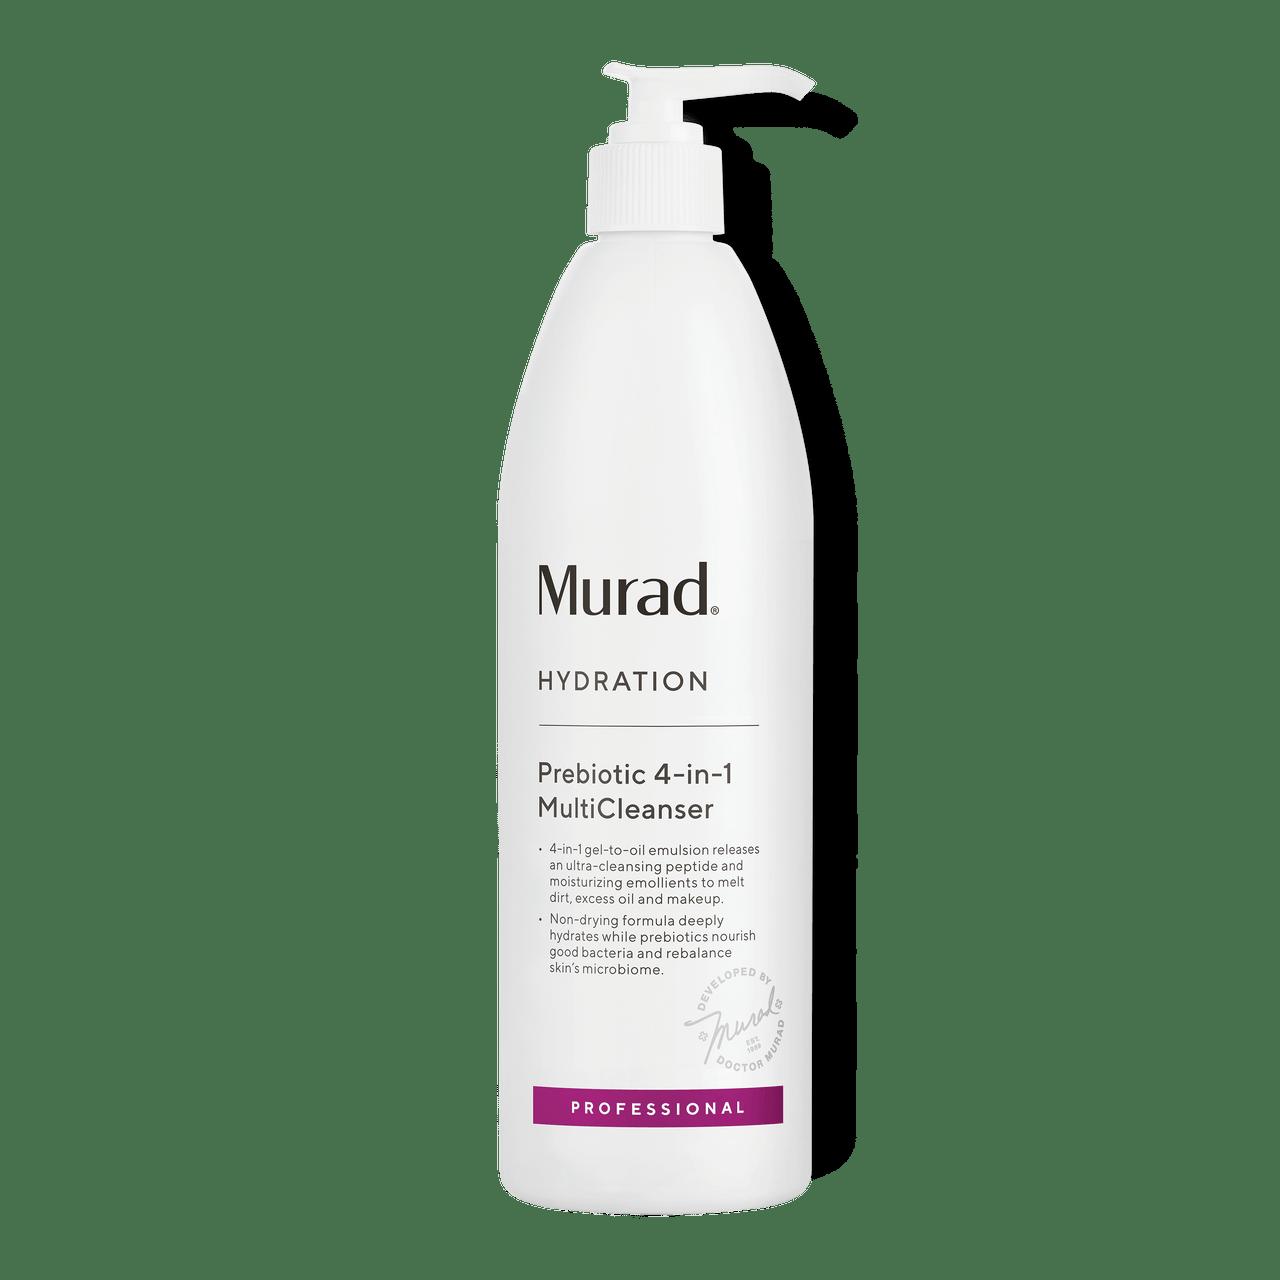 Murad Prebiotic 4-in-1 MultiCleanser Professional Size